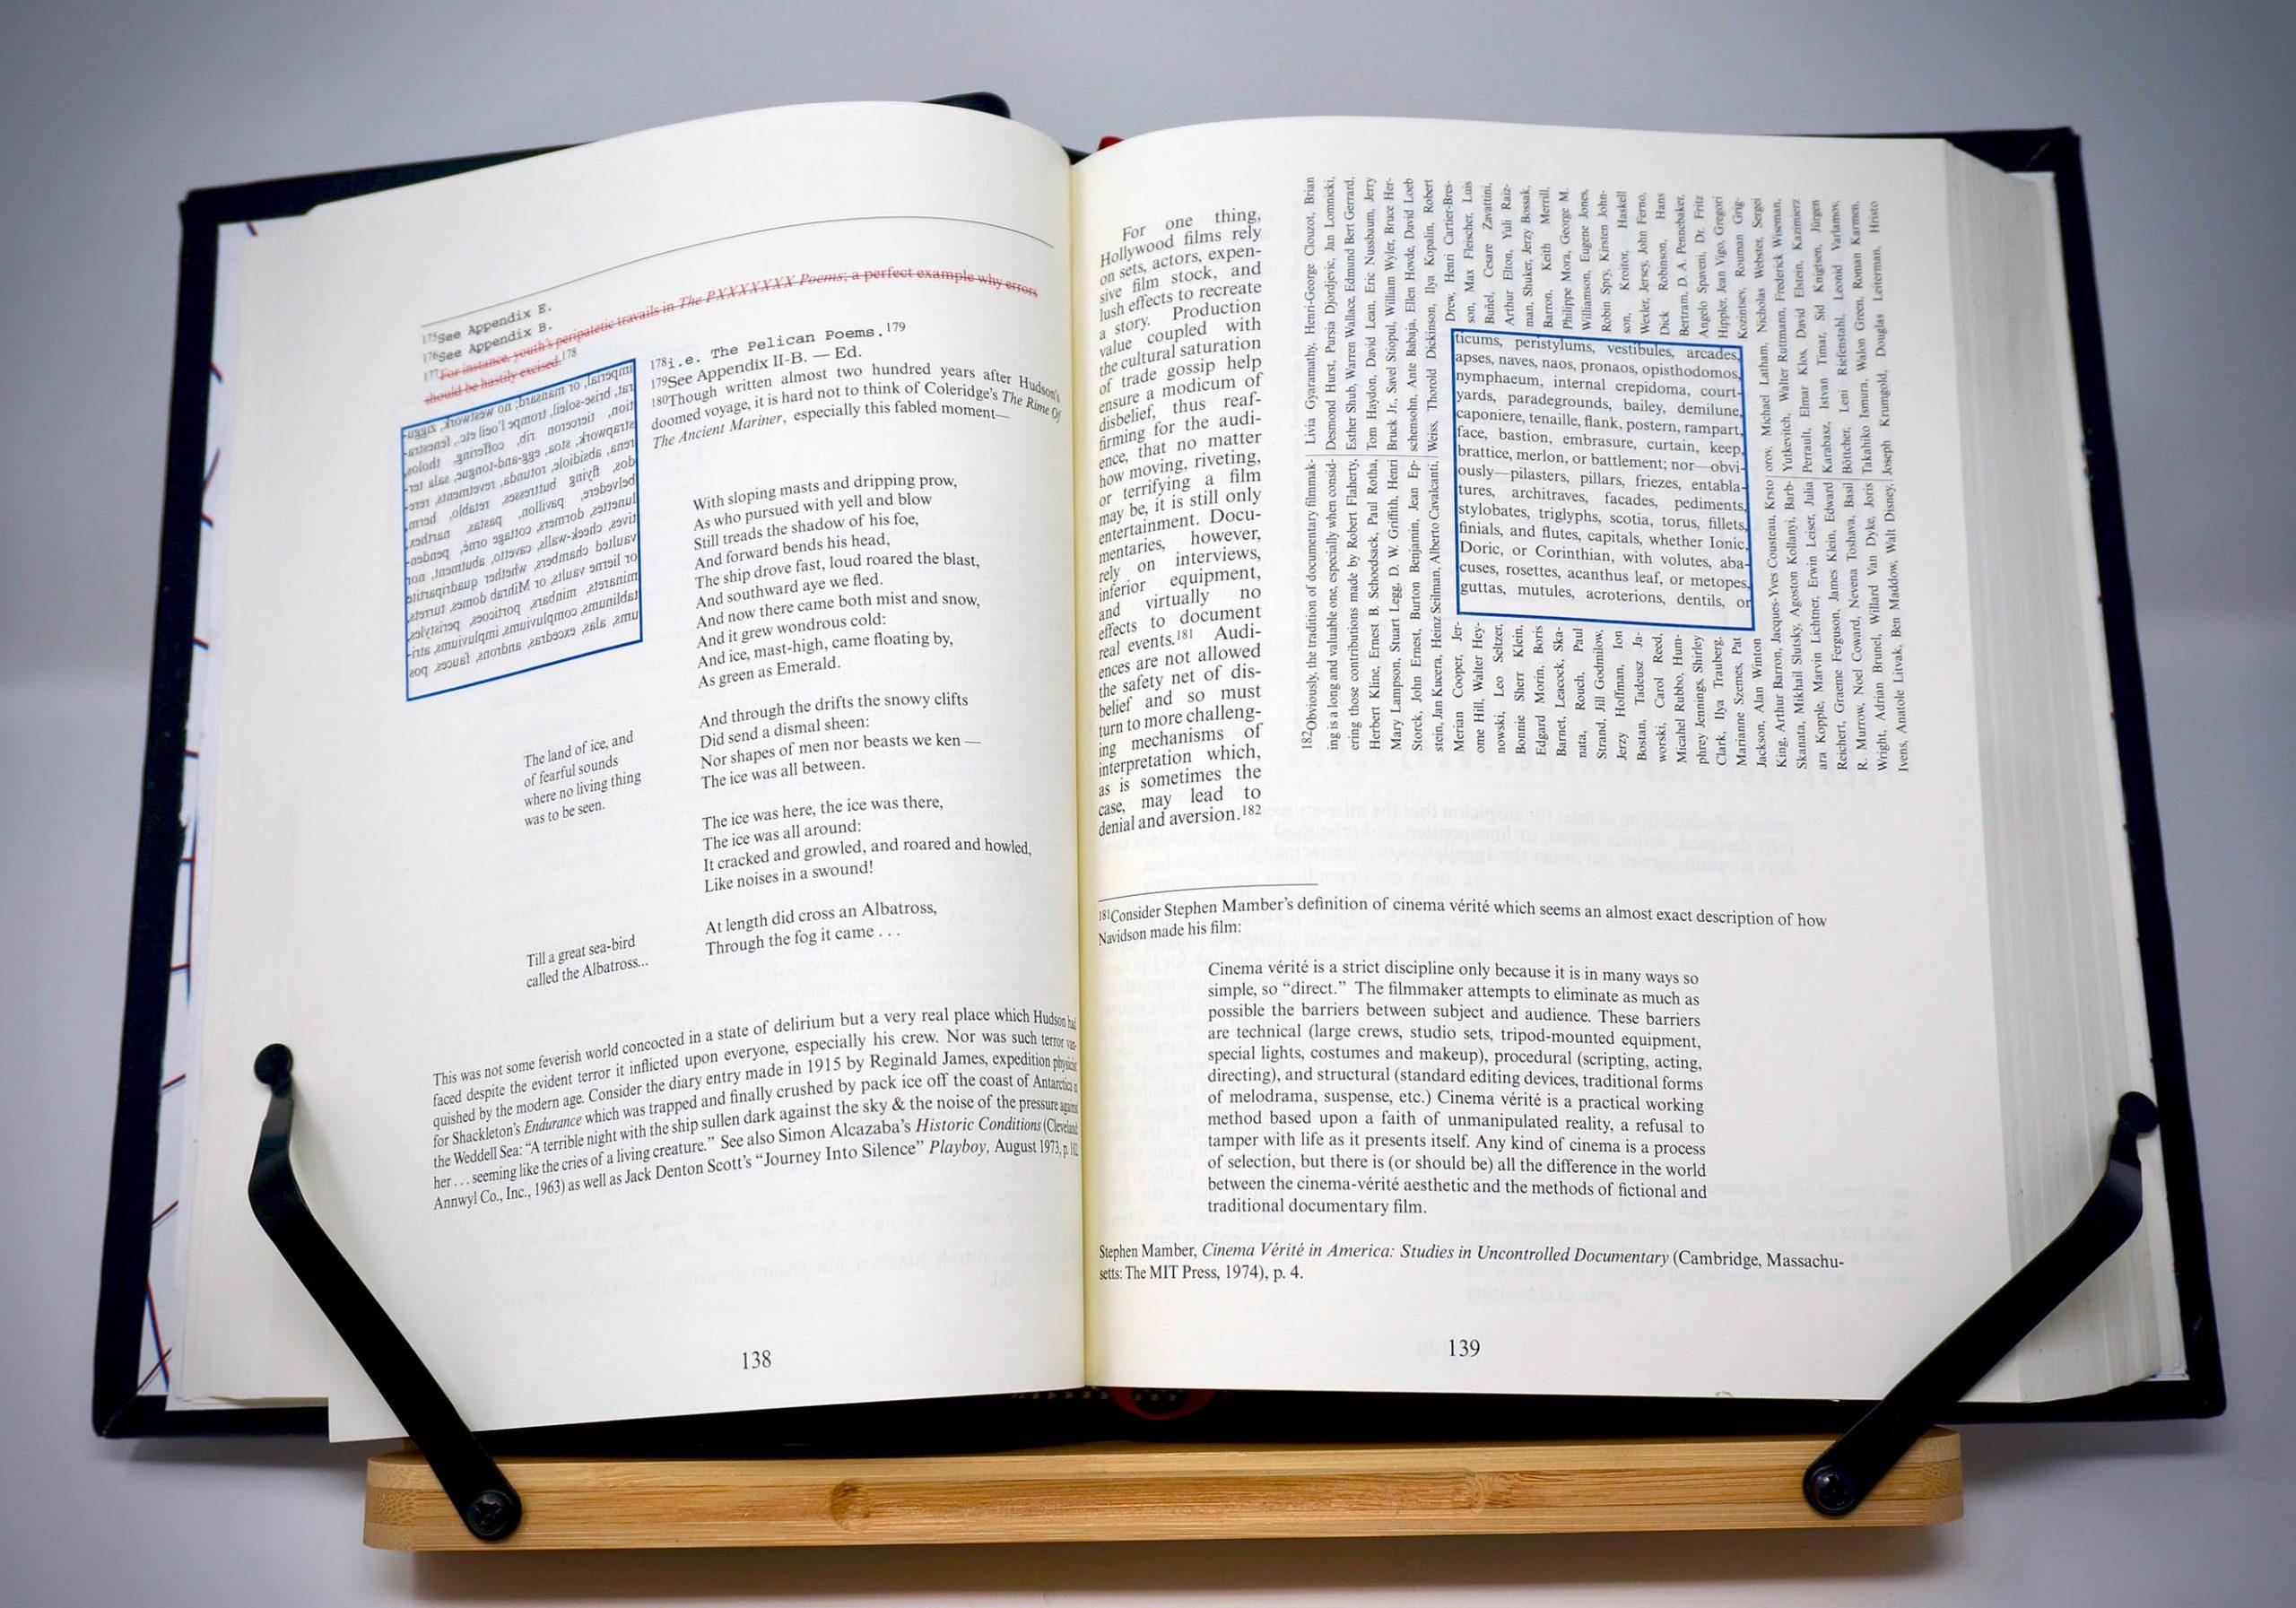 House of Leaves Custom Leather Bound Book Boston Harbor Bookbindery https://bostonharborbooks.com/